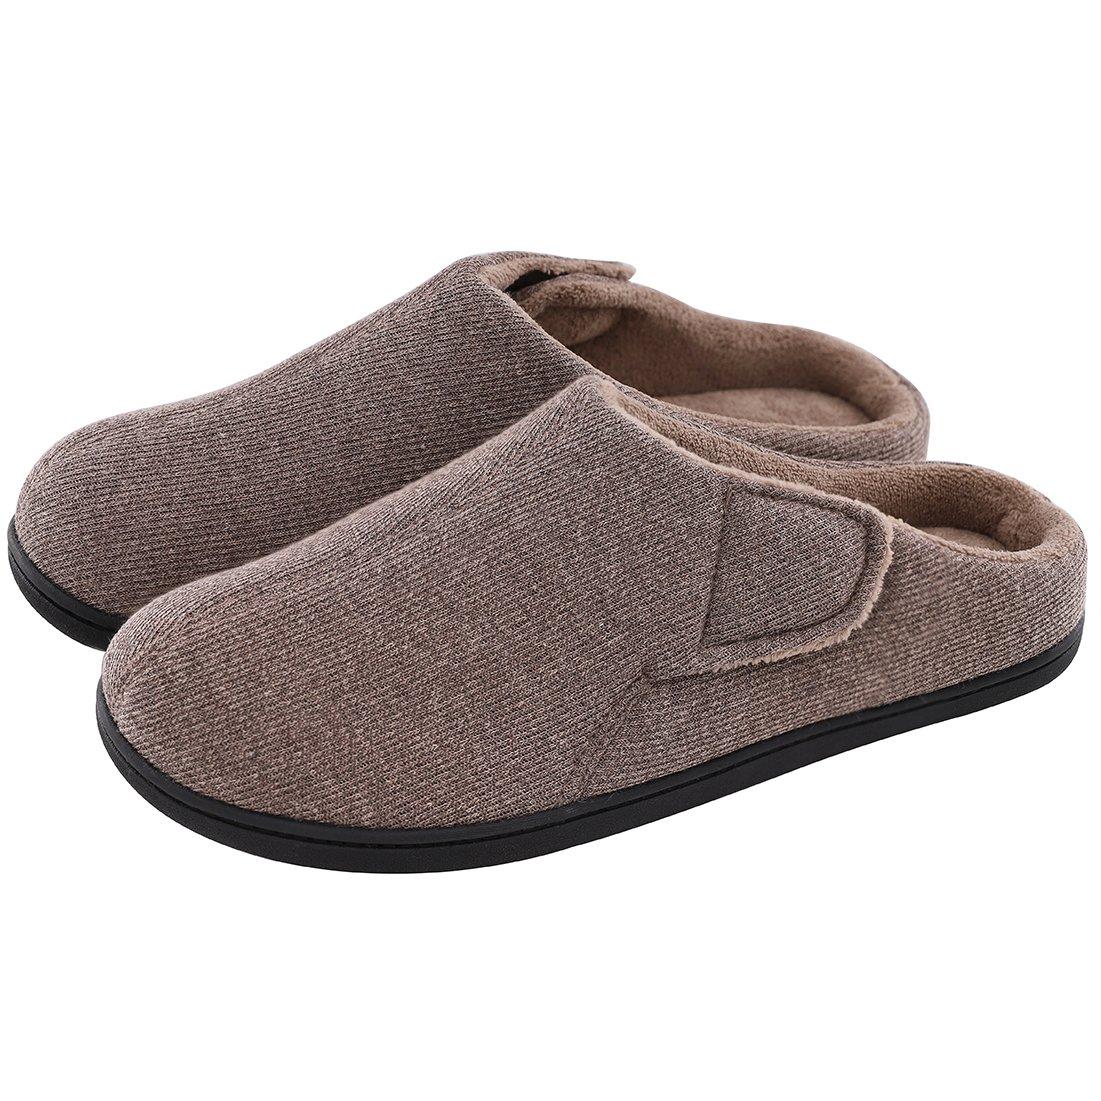 c0c0aa0d4a2075 ULTRAIDEAS Men s Comfort Memory Foam Terry Cloth Slippers Velcro Orthopedic House  Shoes